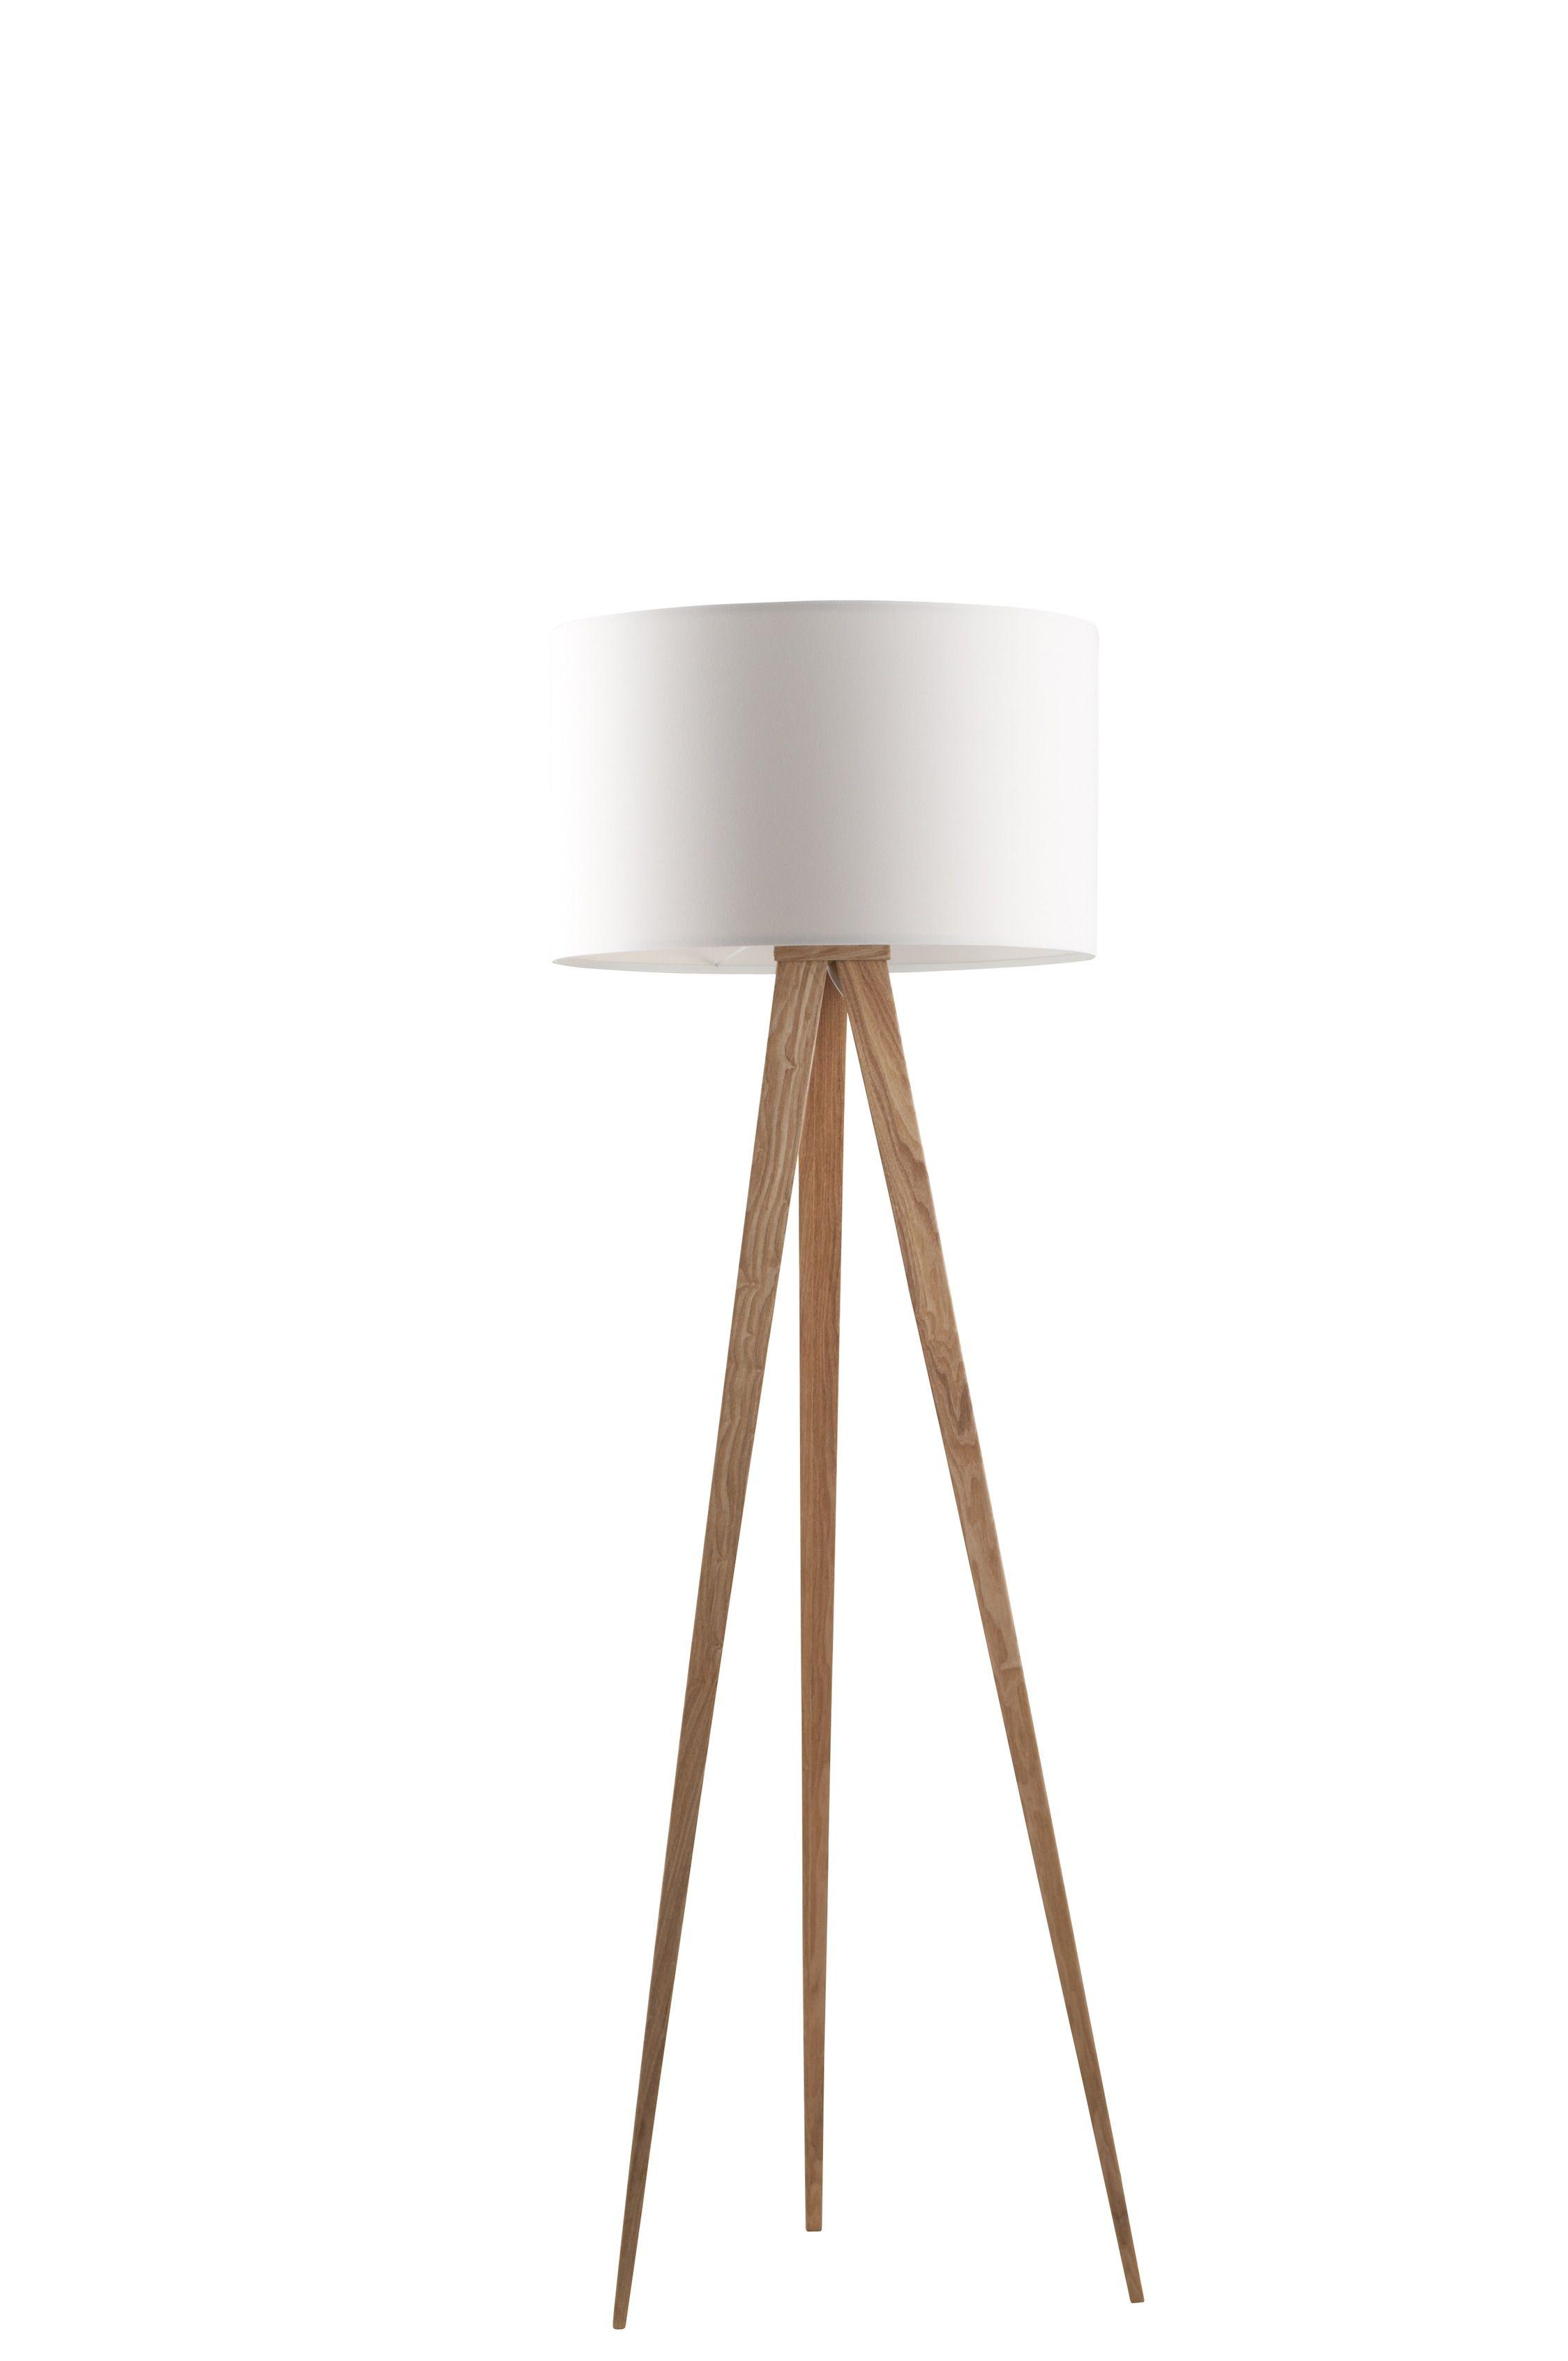 Zuiver Lampa Podlogowa Tripod Wood White Another Design Http Pufadesign Pl Lampy I Oswietlenie De White Floor Lamp Tripod Floor Lamps Beautiful Floor Lamps